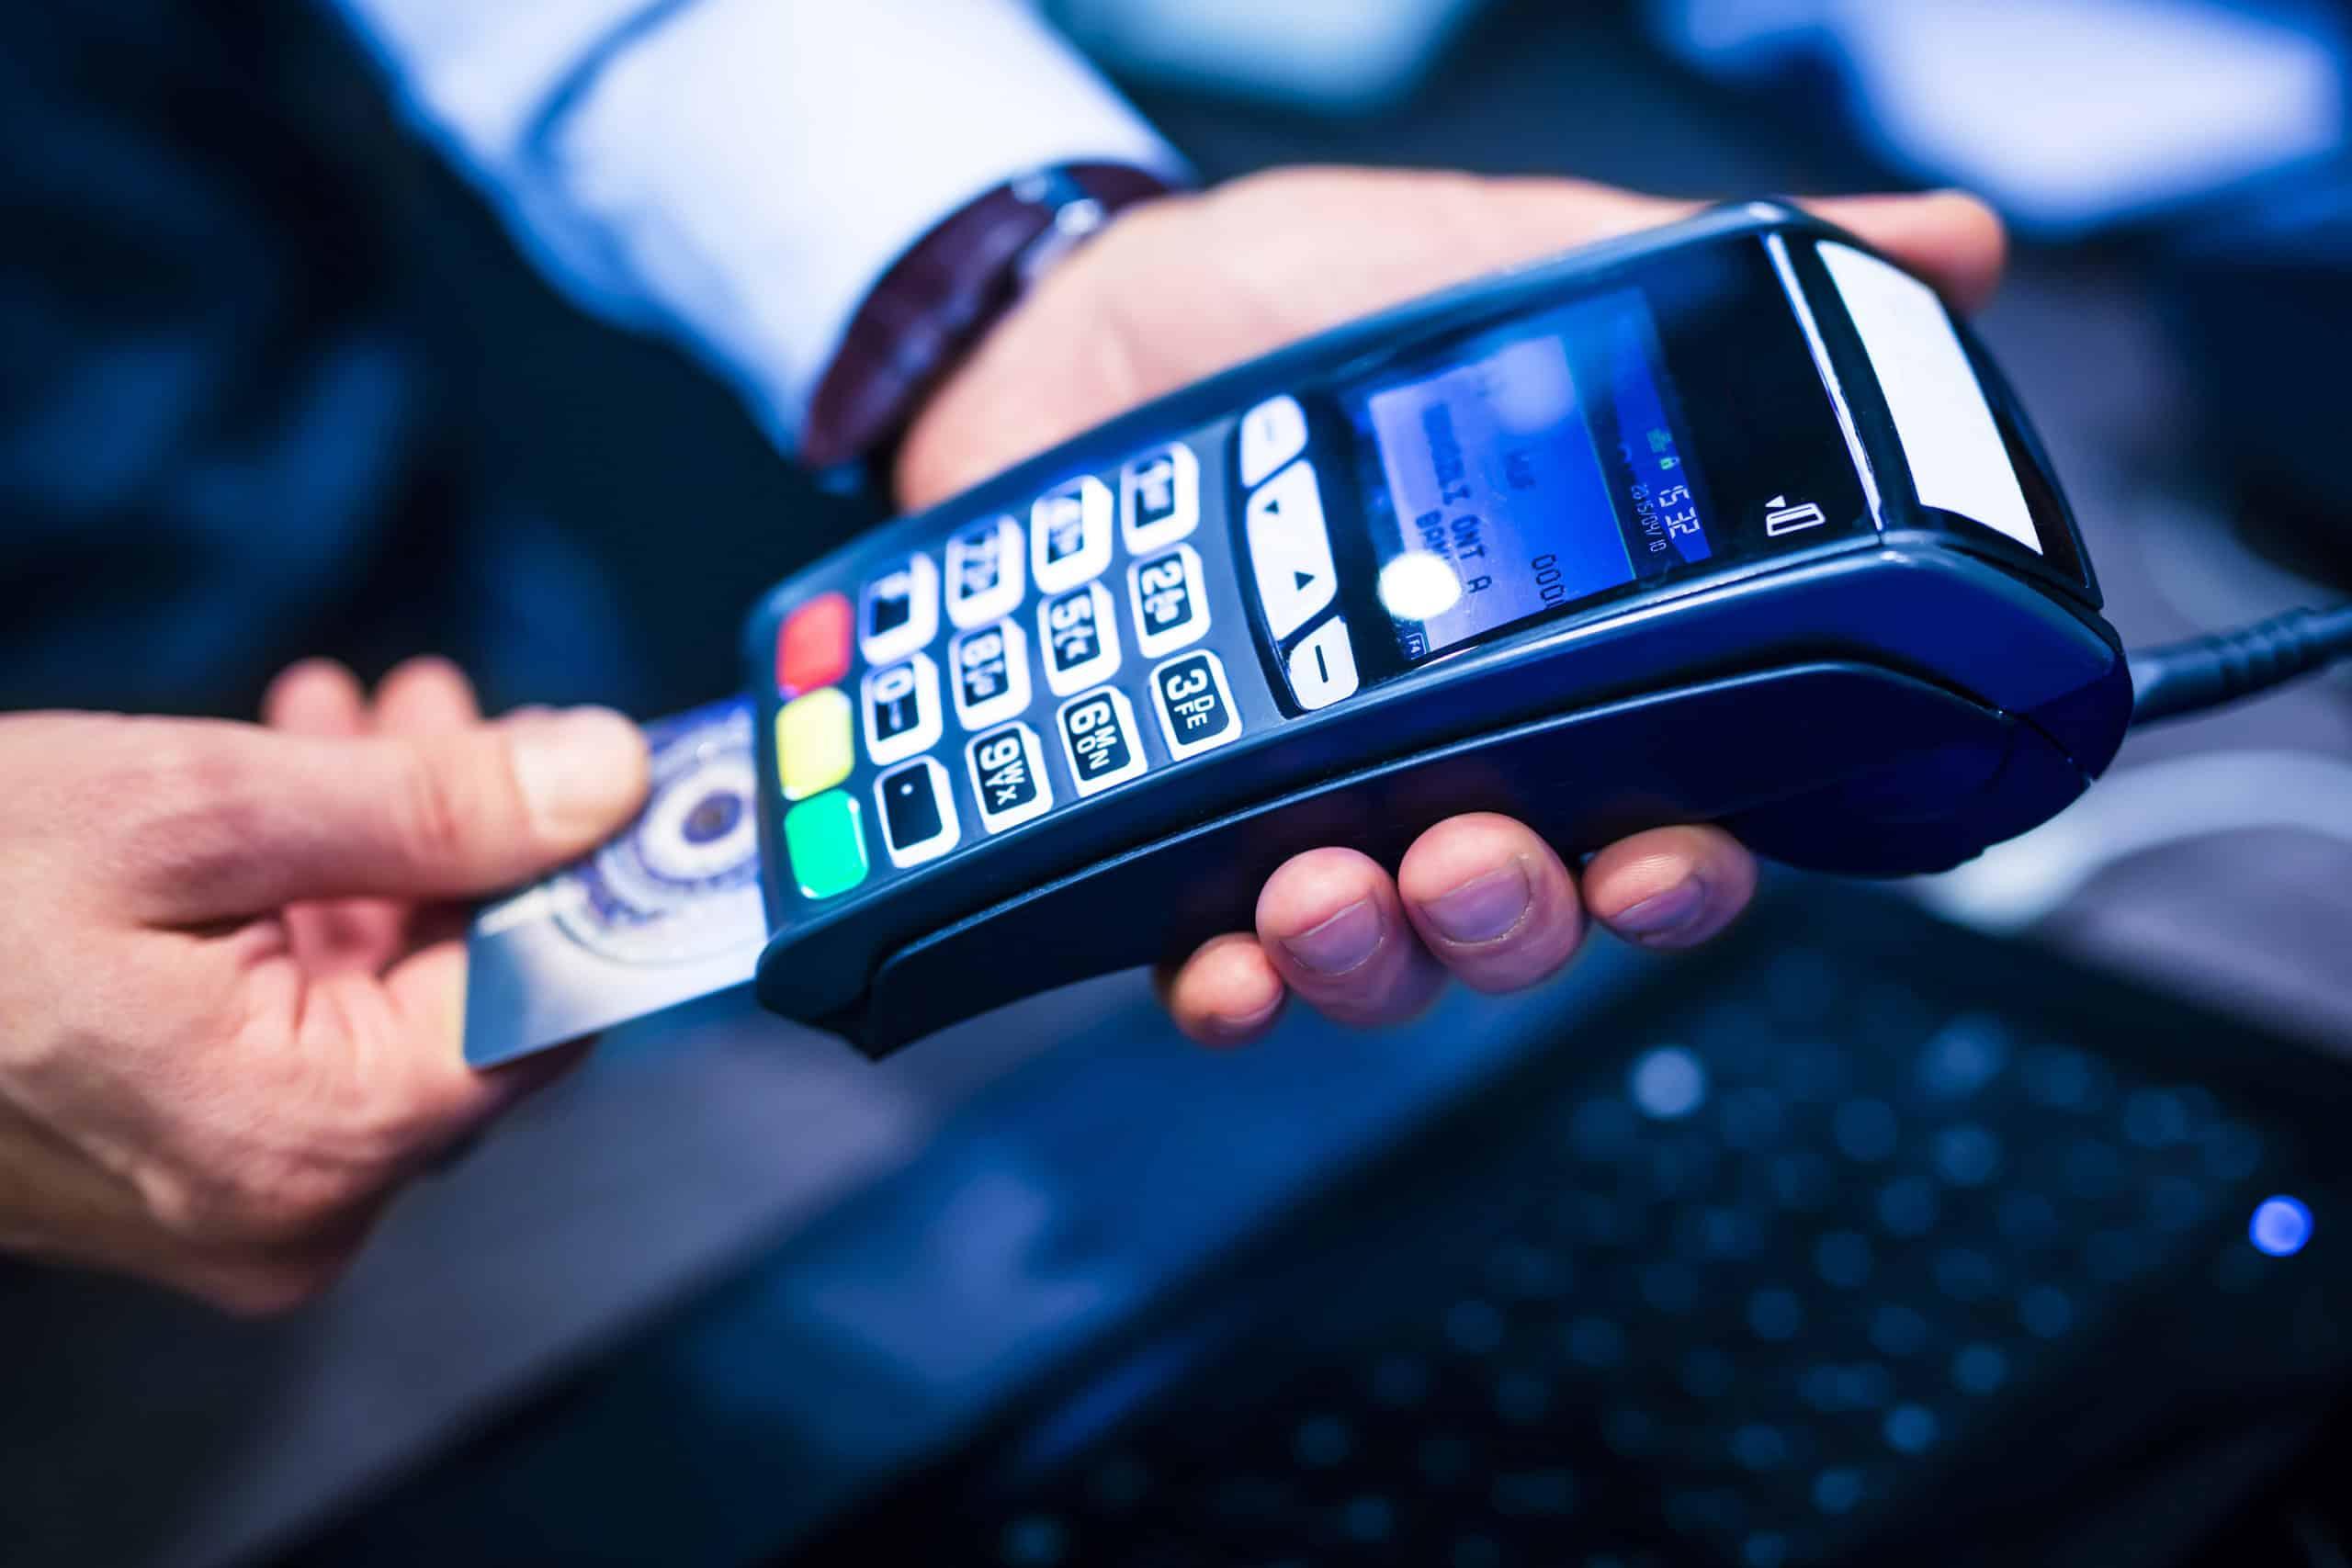 Bureaux de crédito brasileiros cdl bh quase oito milhões de